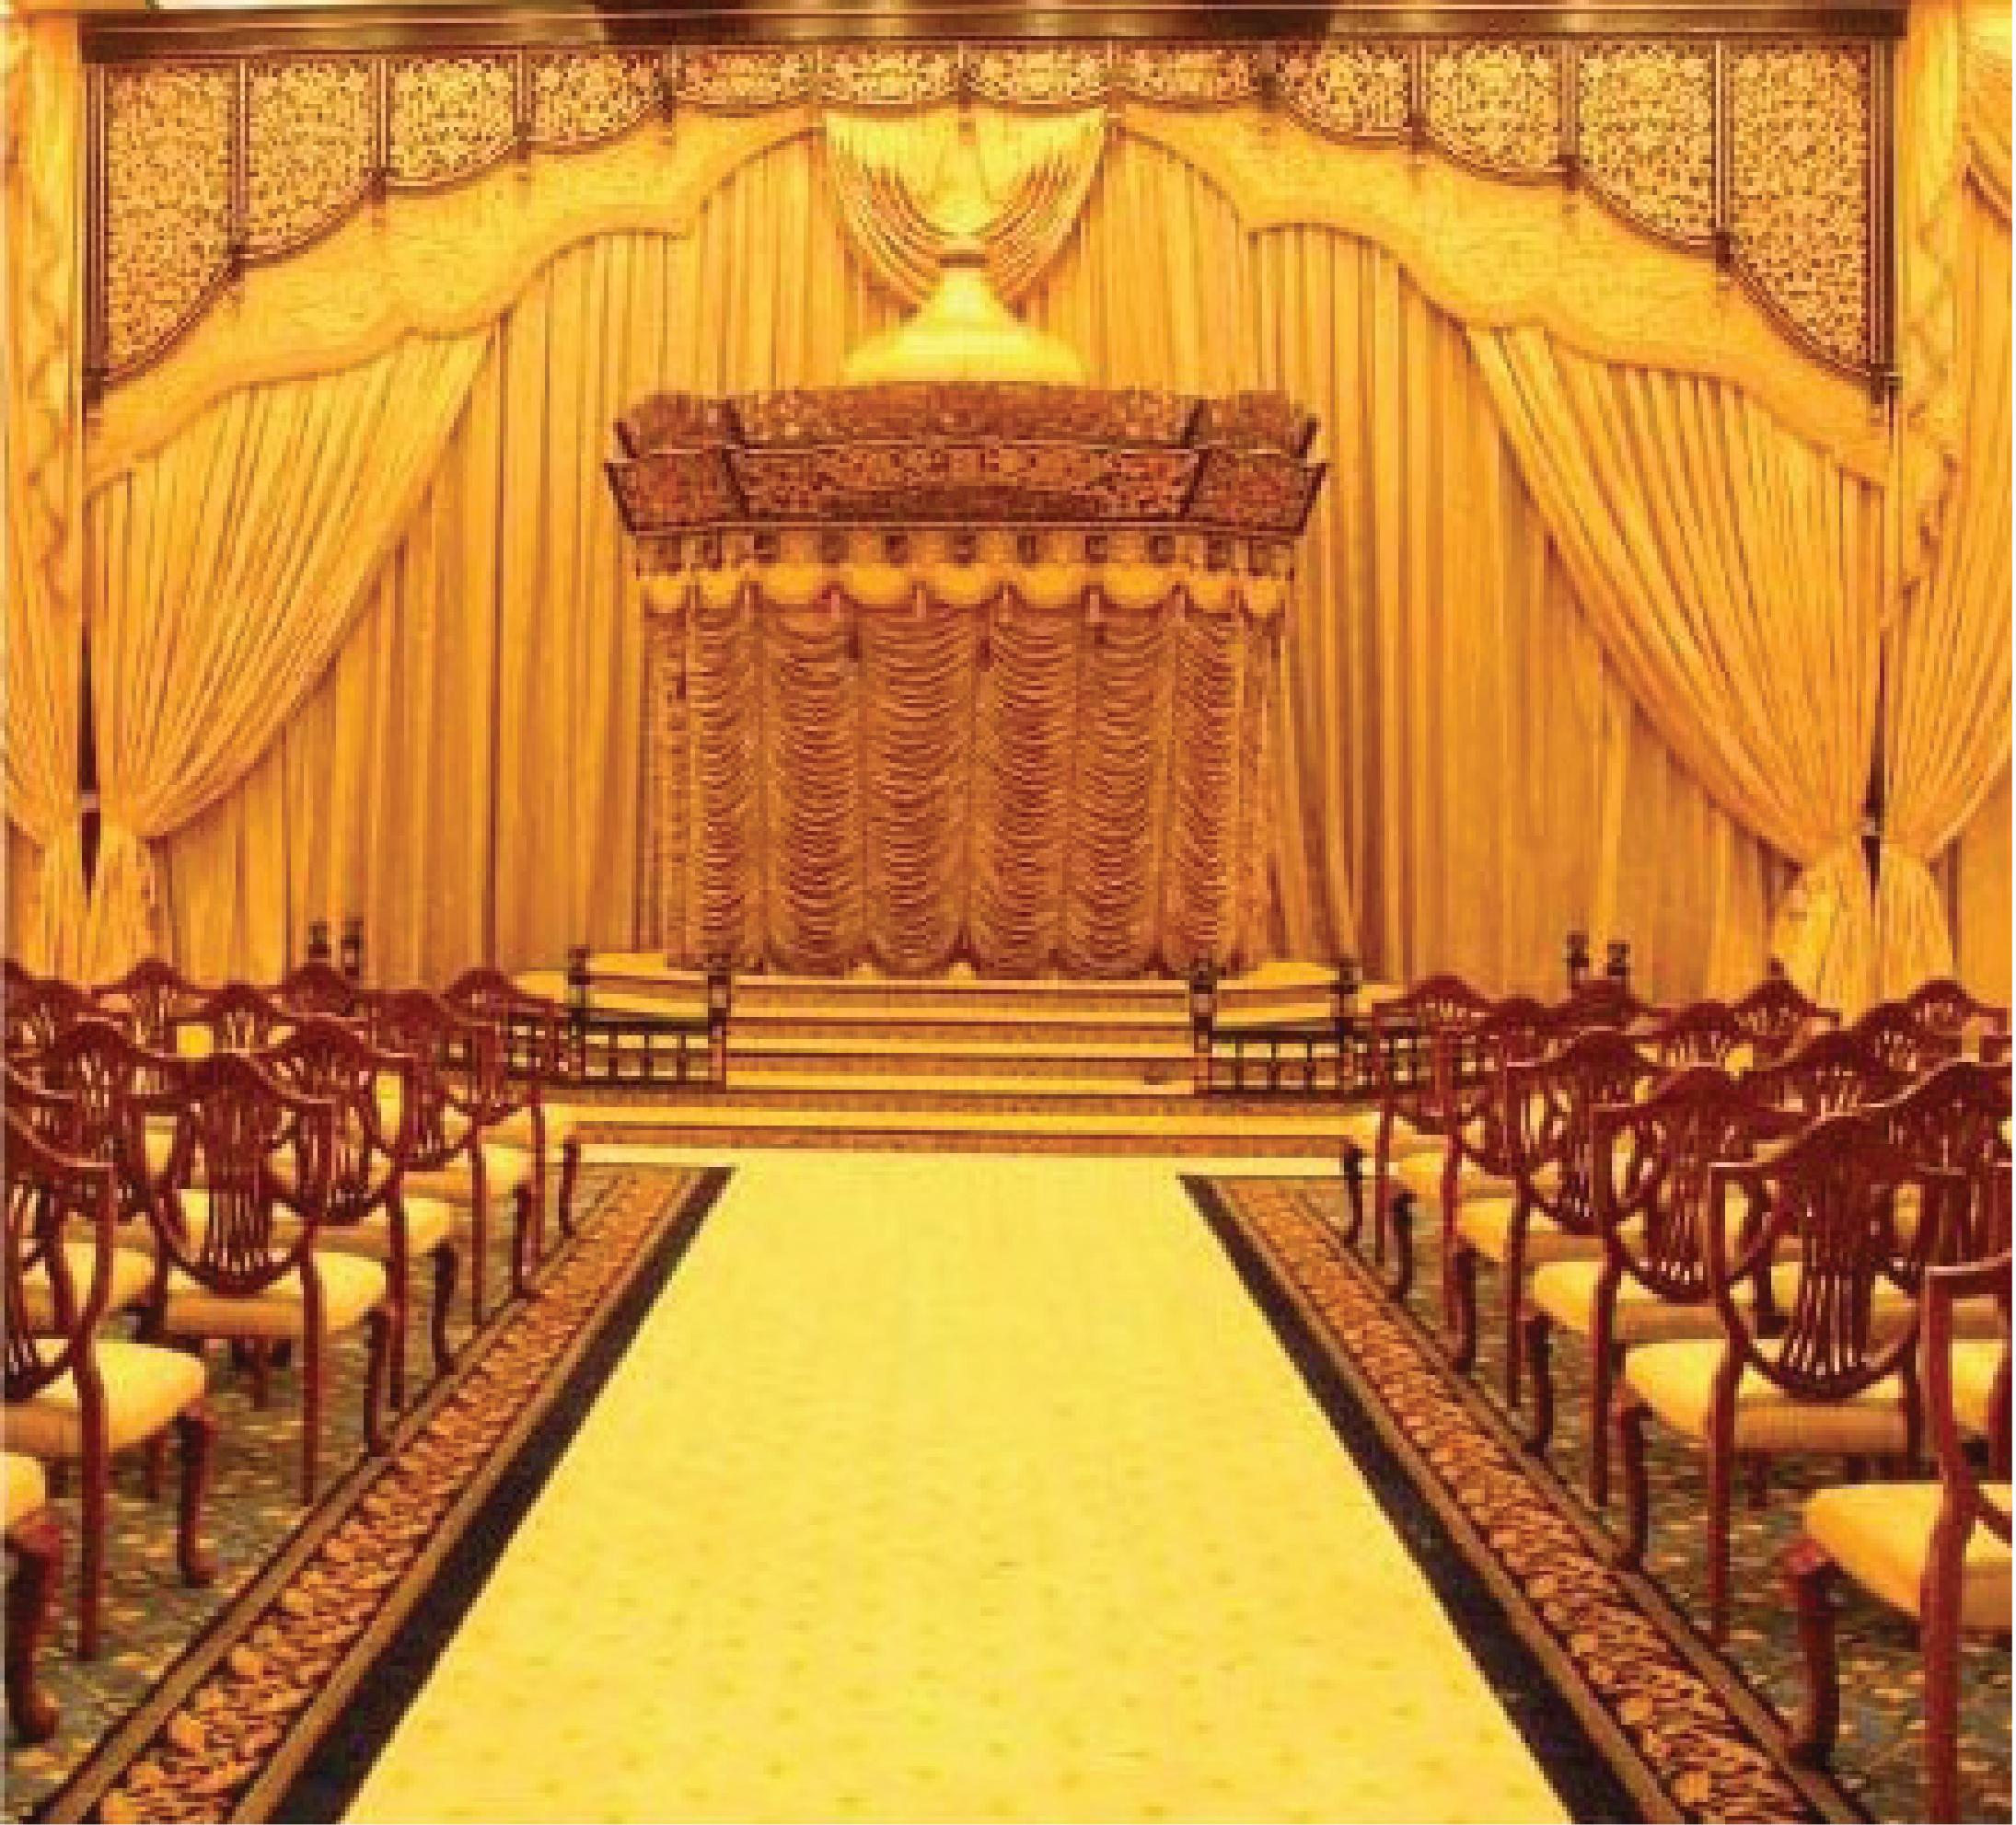 istana-negara-kl-2014-features